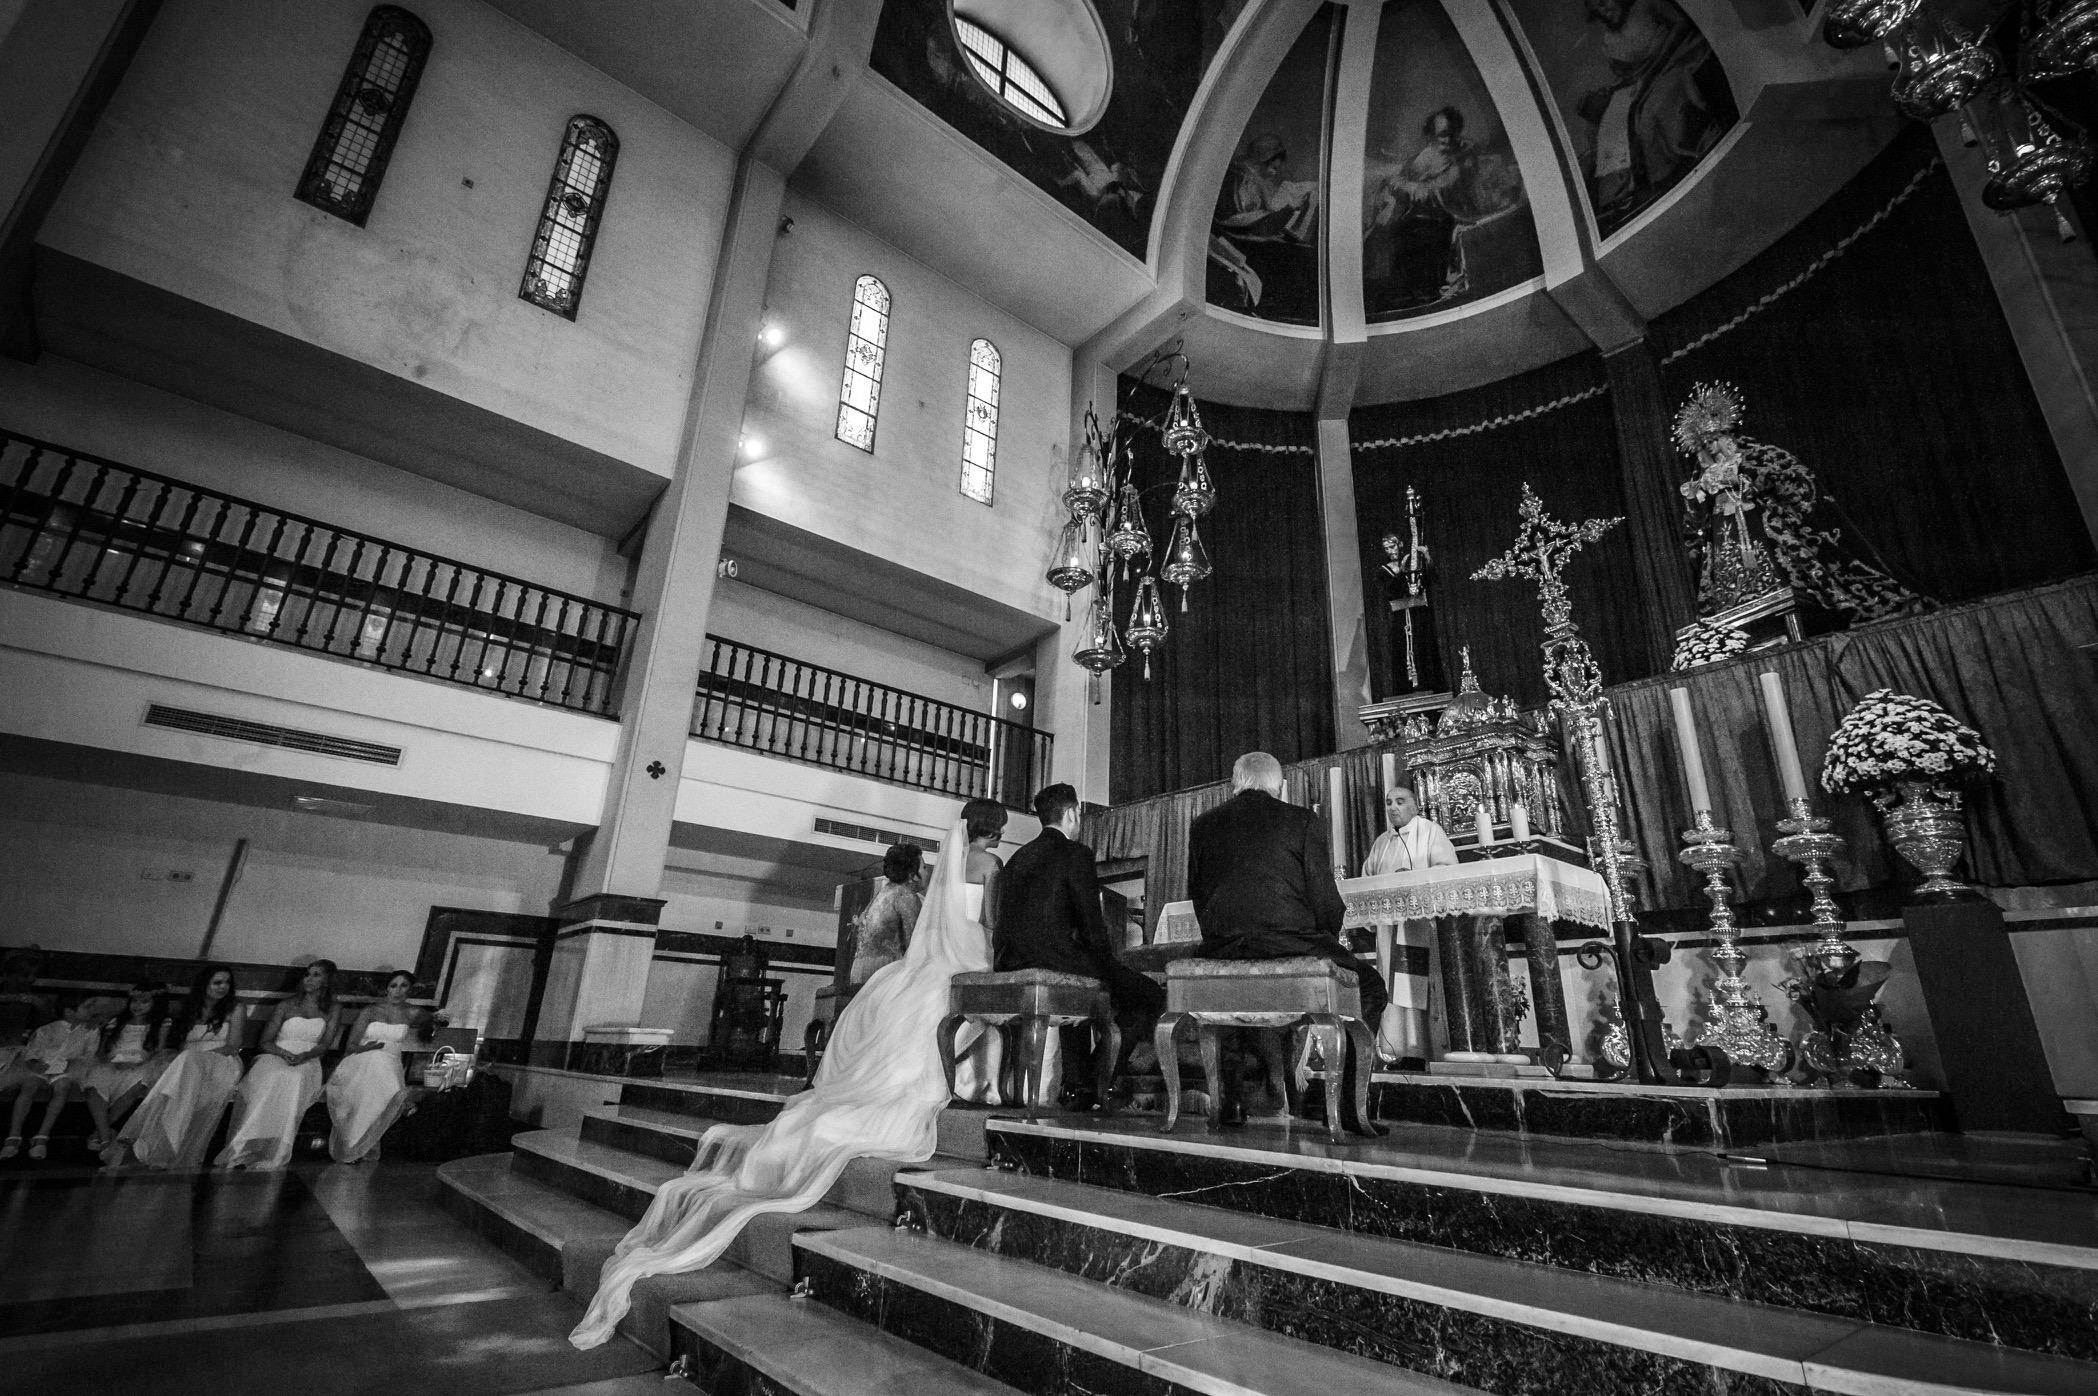 Si-Quiero-Wedding-Planner-By-Sira-Antequera-Virginia-Jose-9